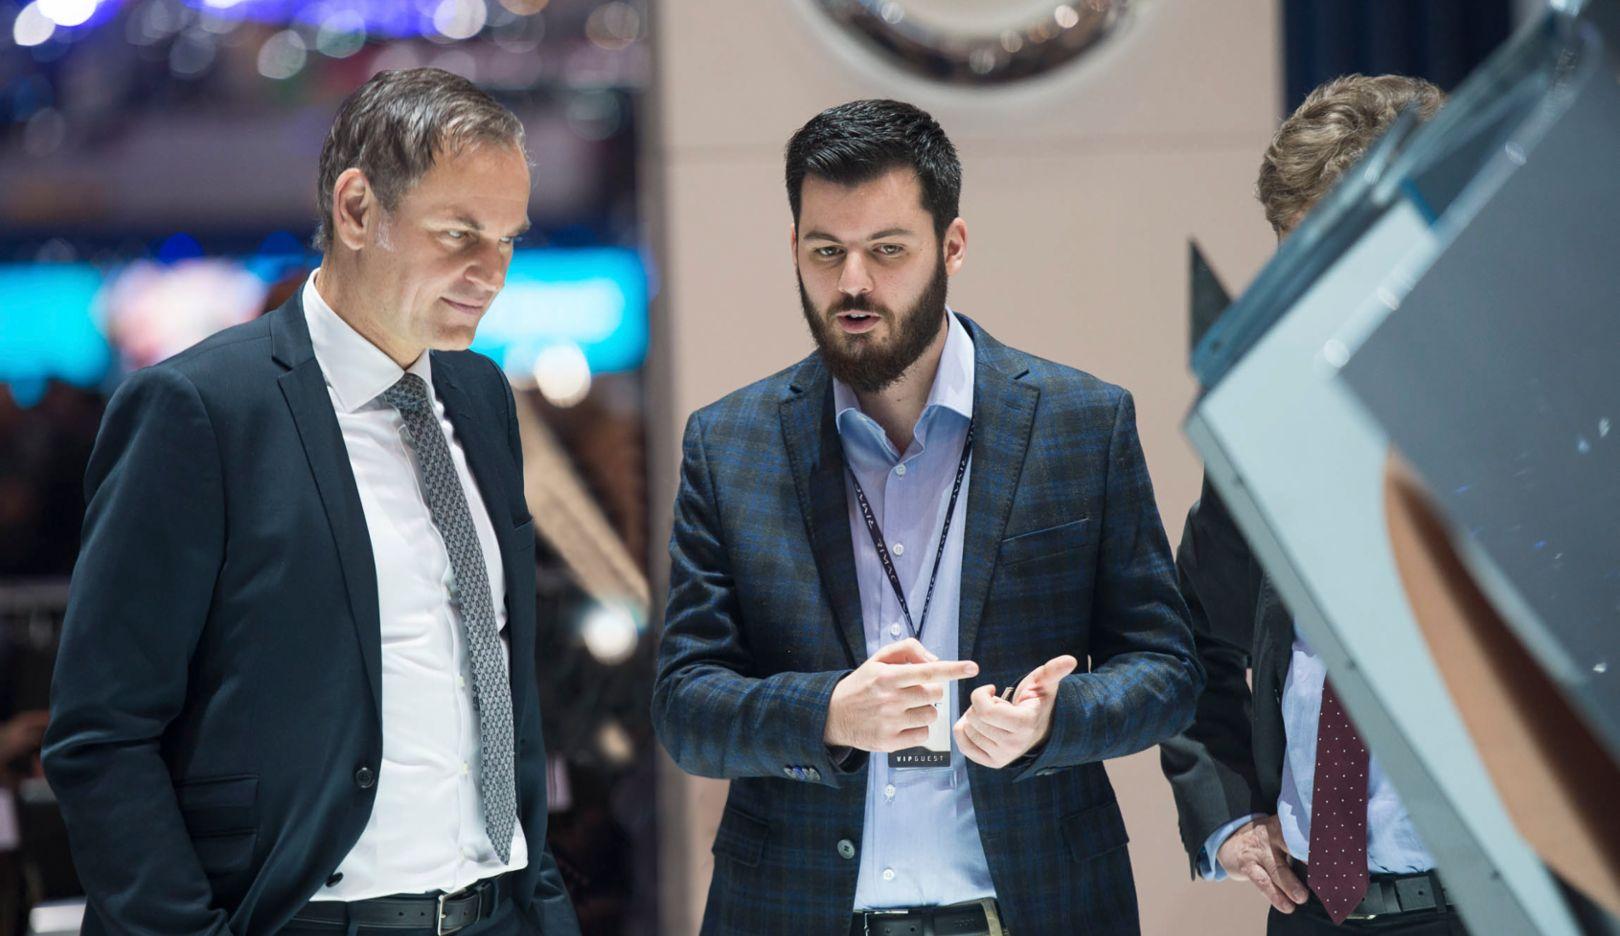 Oliver Blume, CEO of Porsche AG, Mate Rimac, CEO of Rimac Automobili, l-r, 2018, Porsche AG